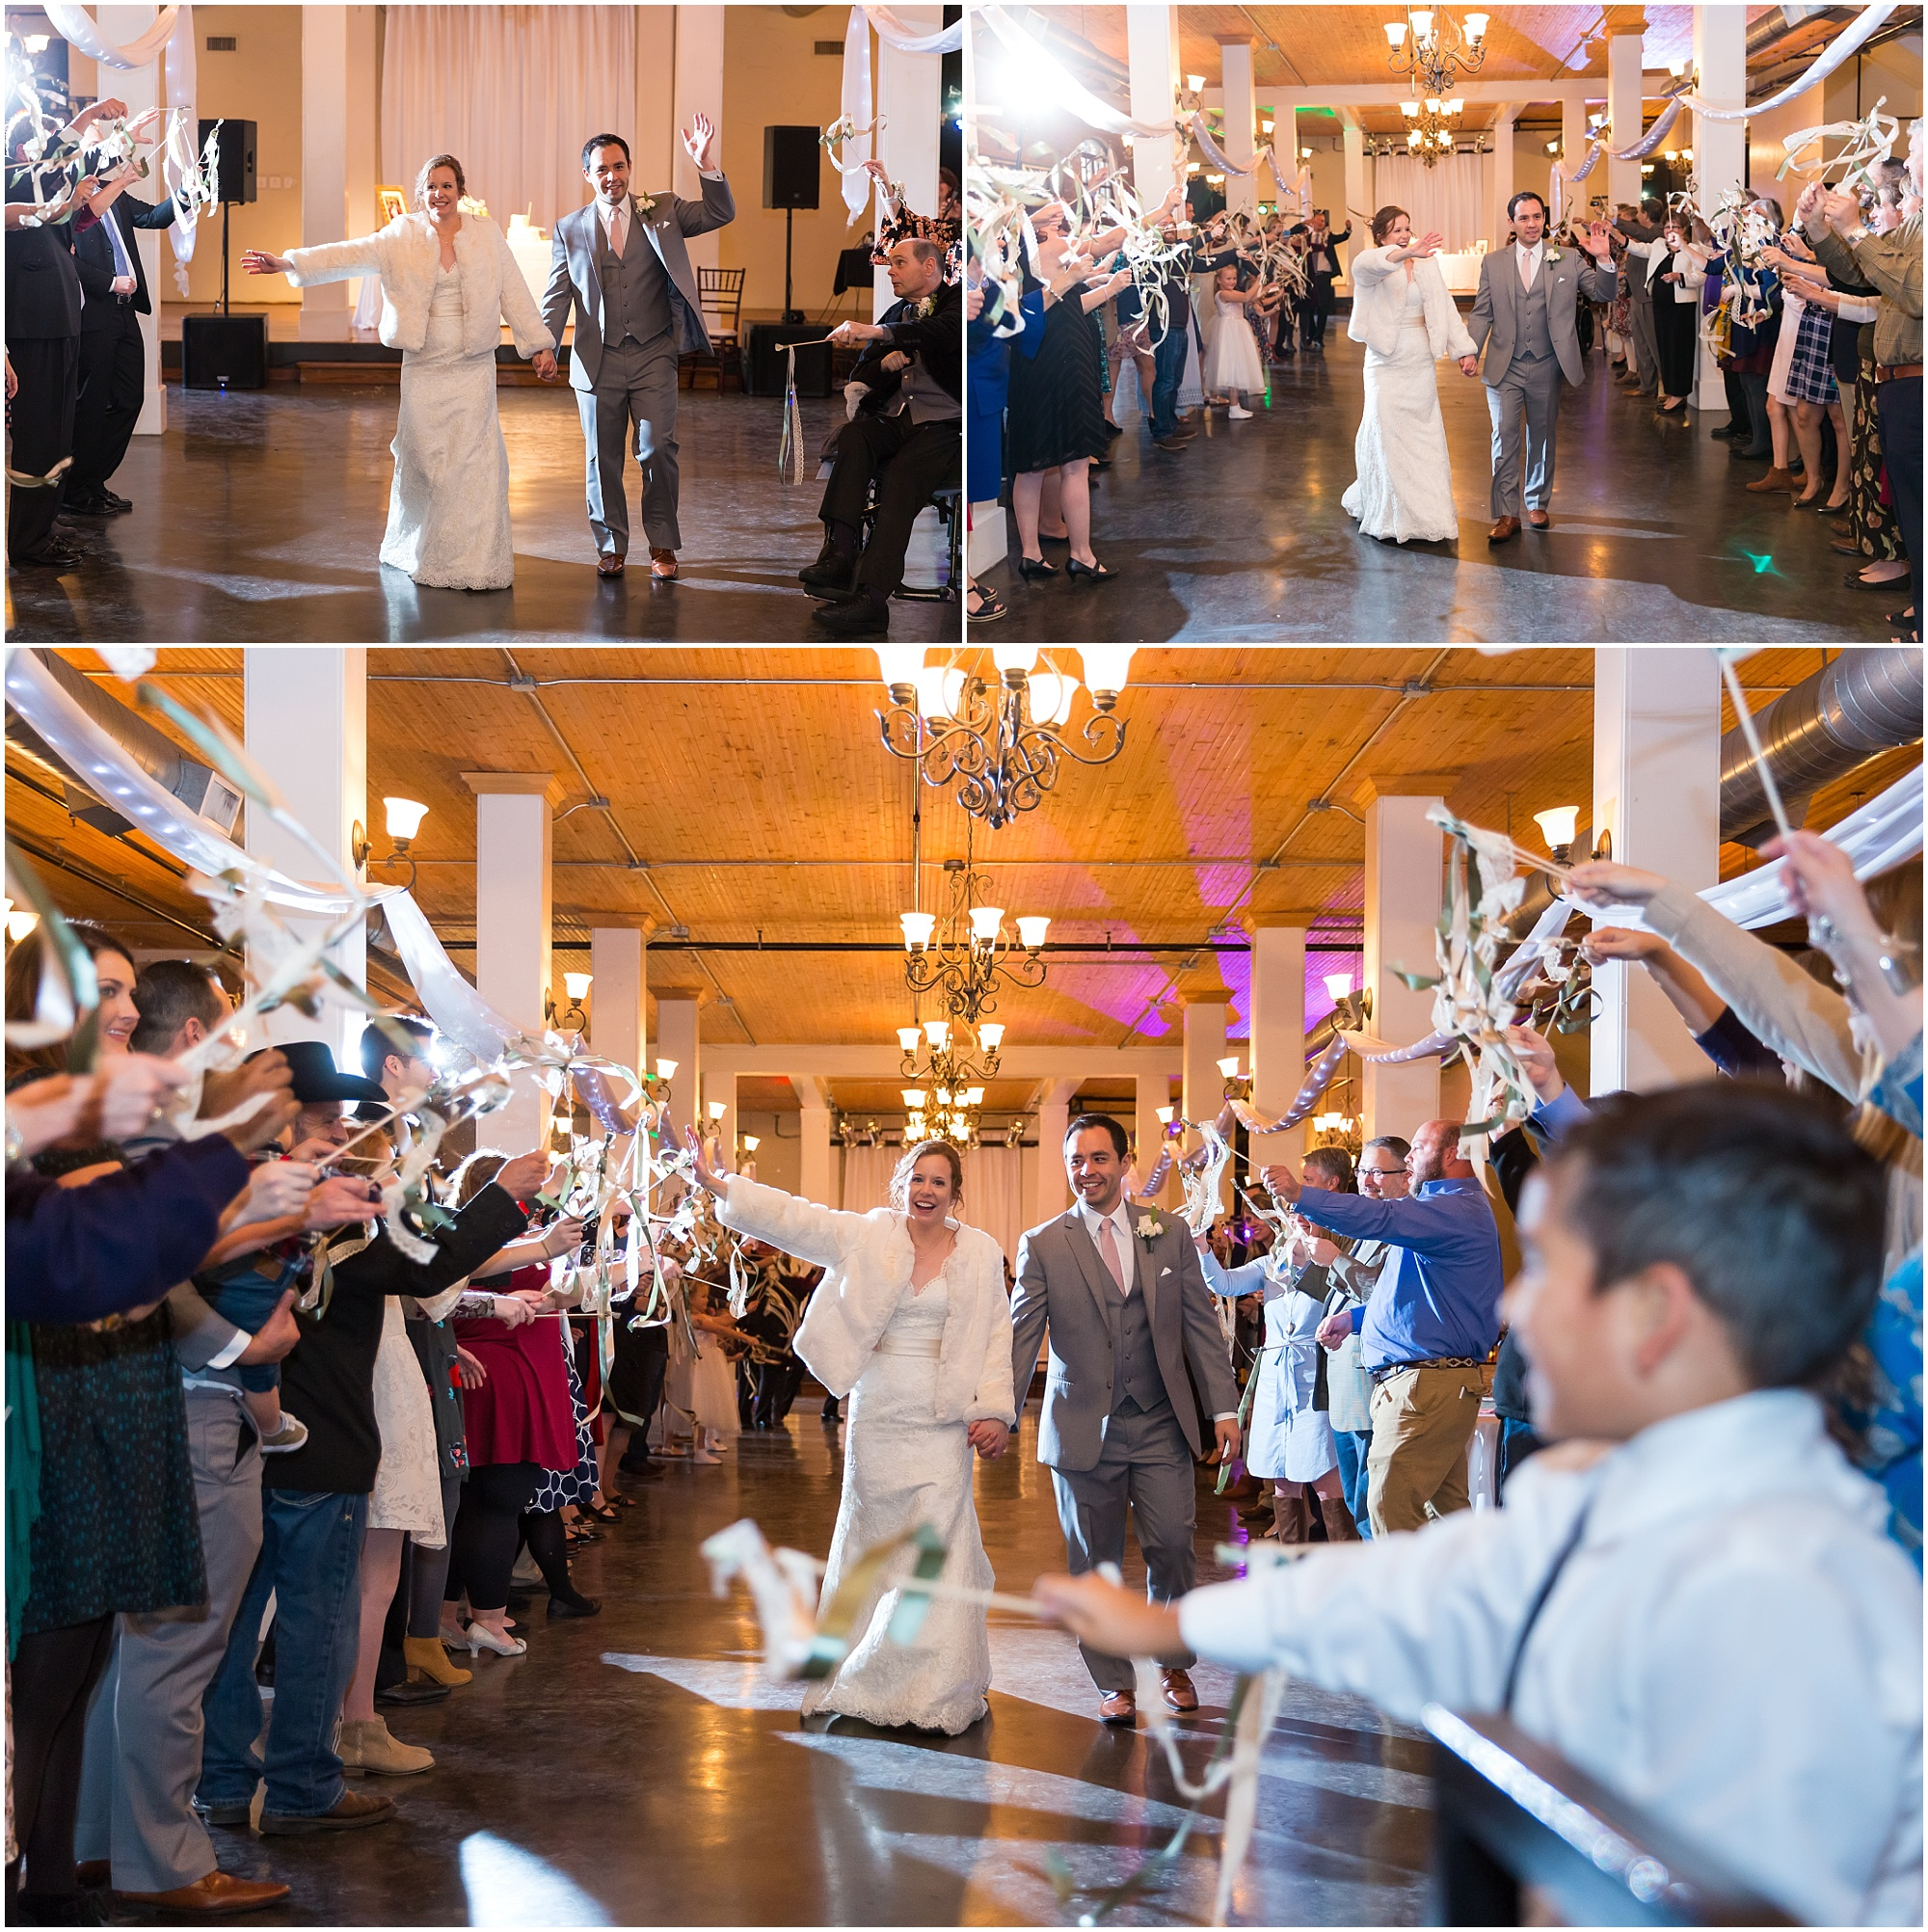 Bride and groom have ribbon exit out of The Palladium in Waco, Texas - Jason & Melaina Photography - www.jasonandmelaina.com